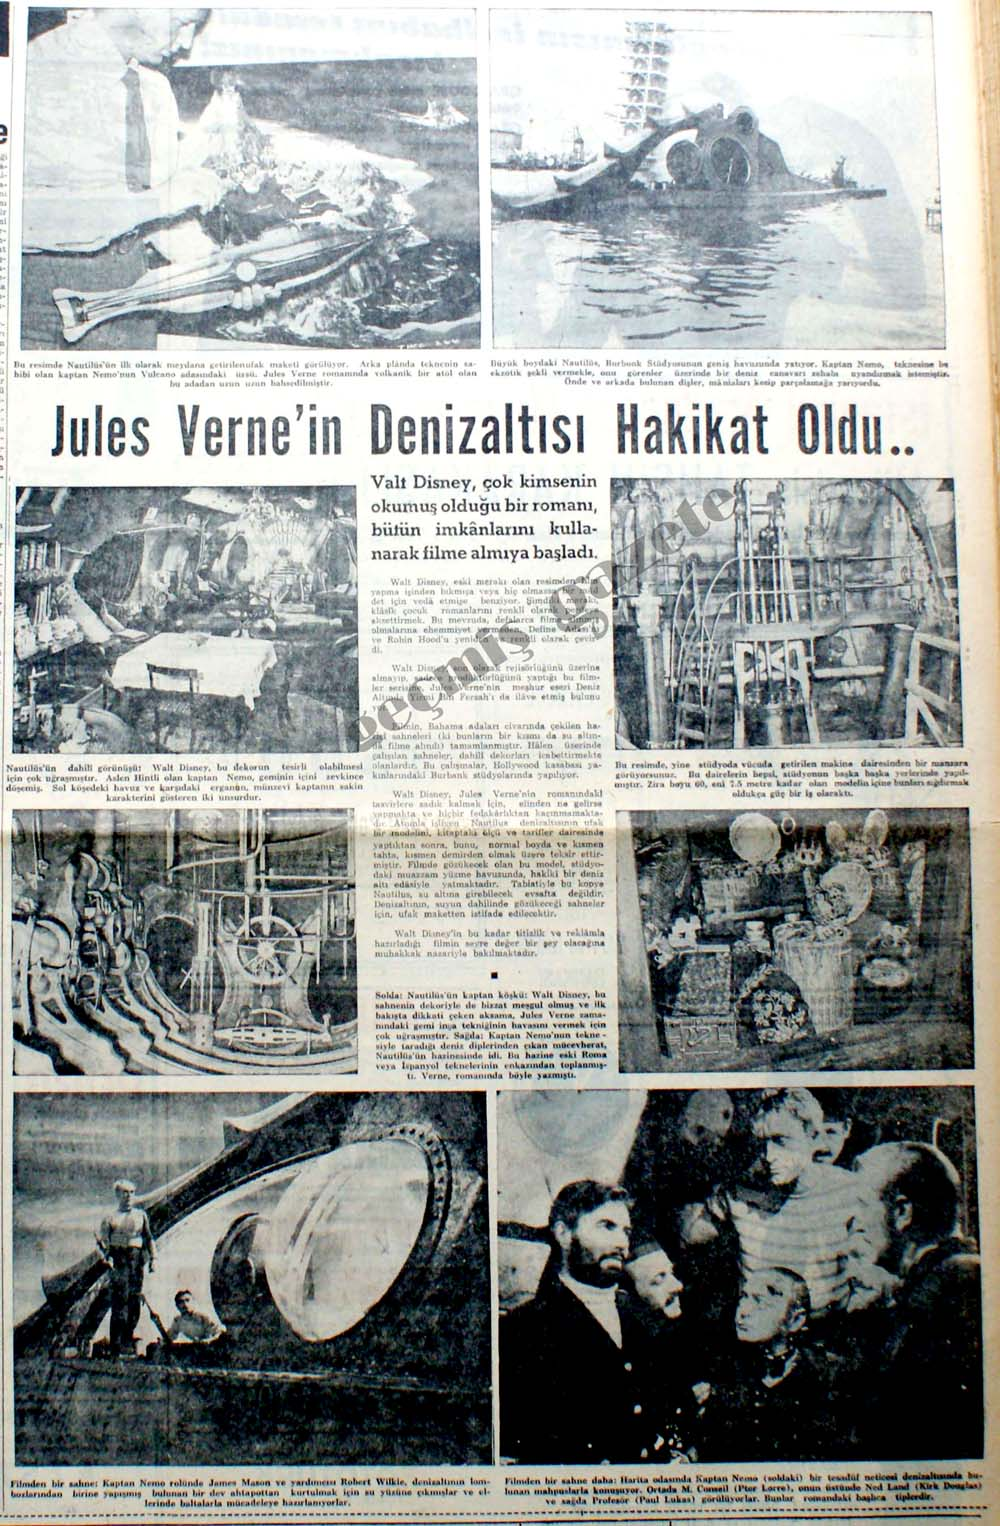 Jules Verne'in Denizaltısı Hakikat Oldu